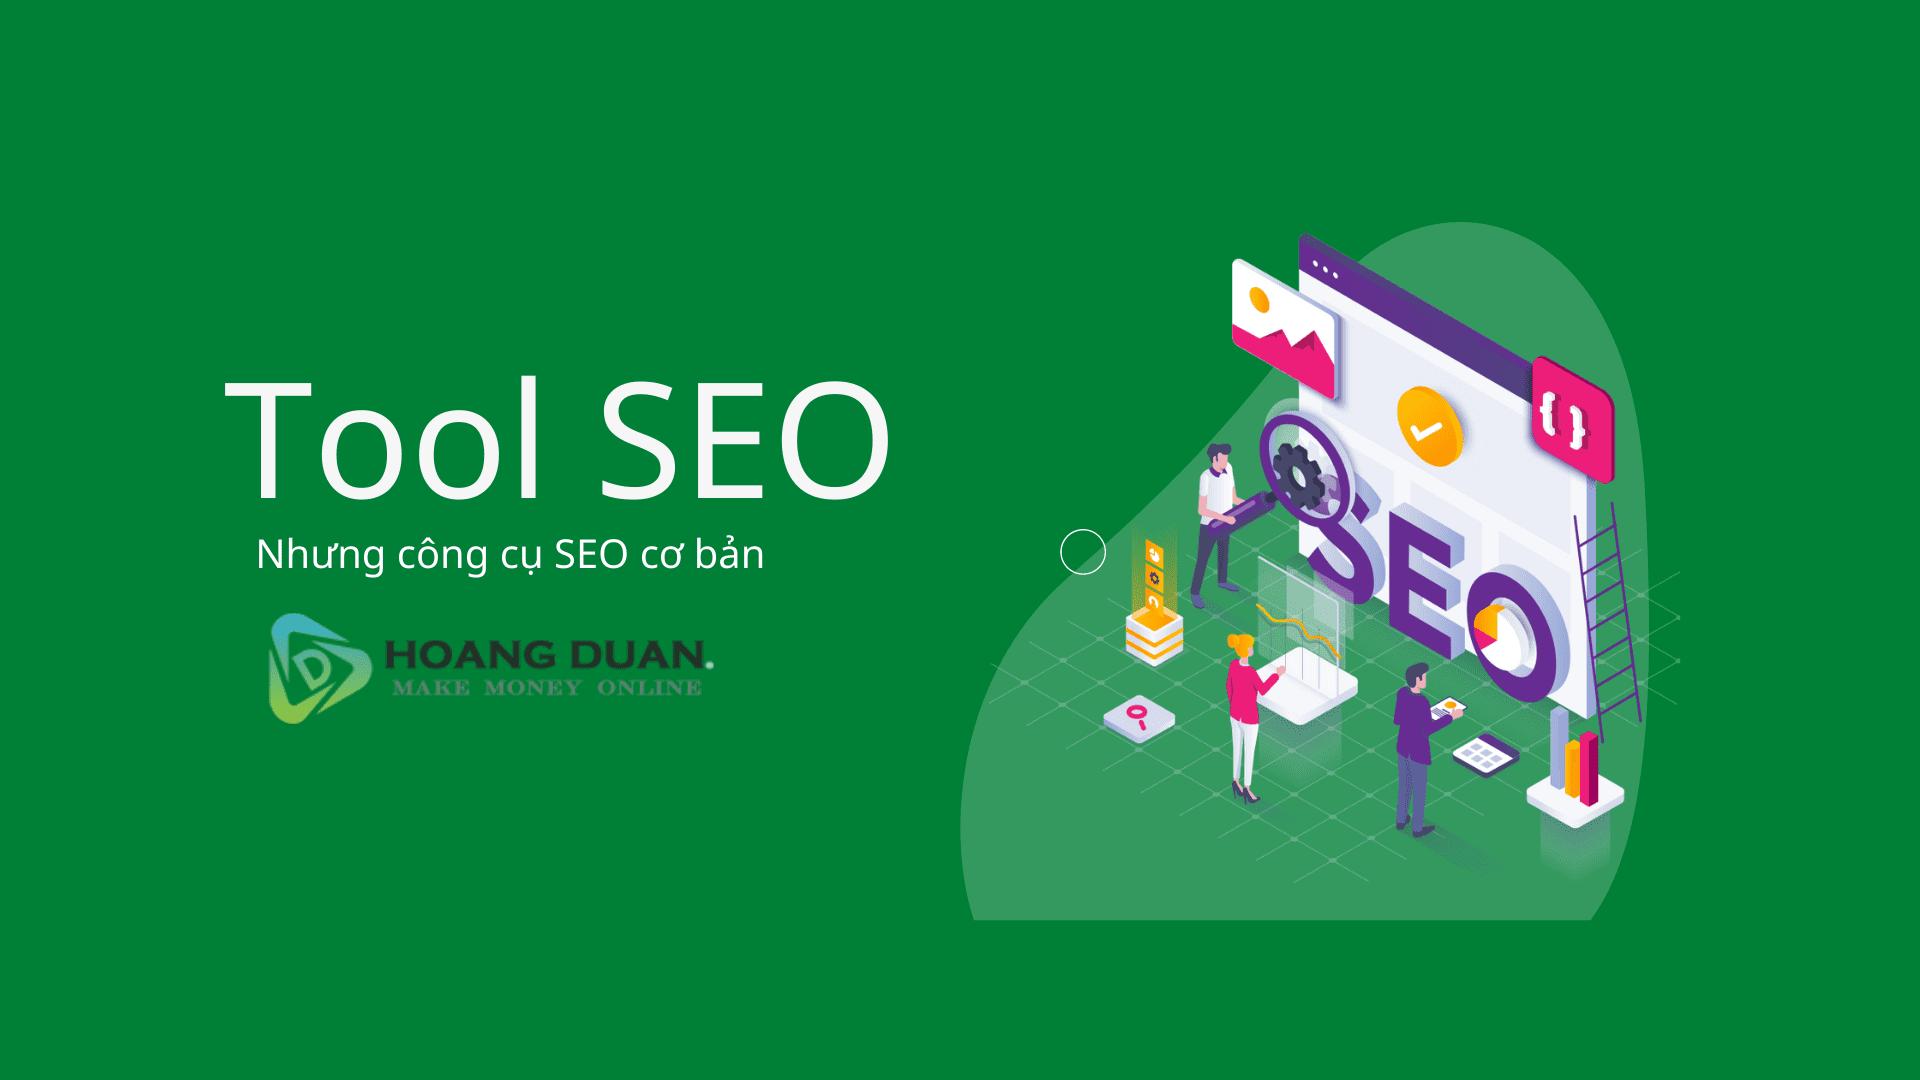 top-10-công-cụ-seo-ngon_optimized